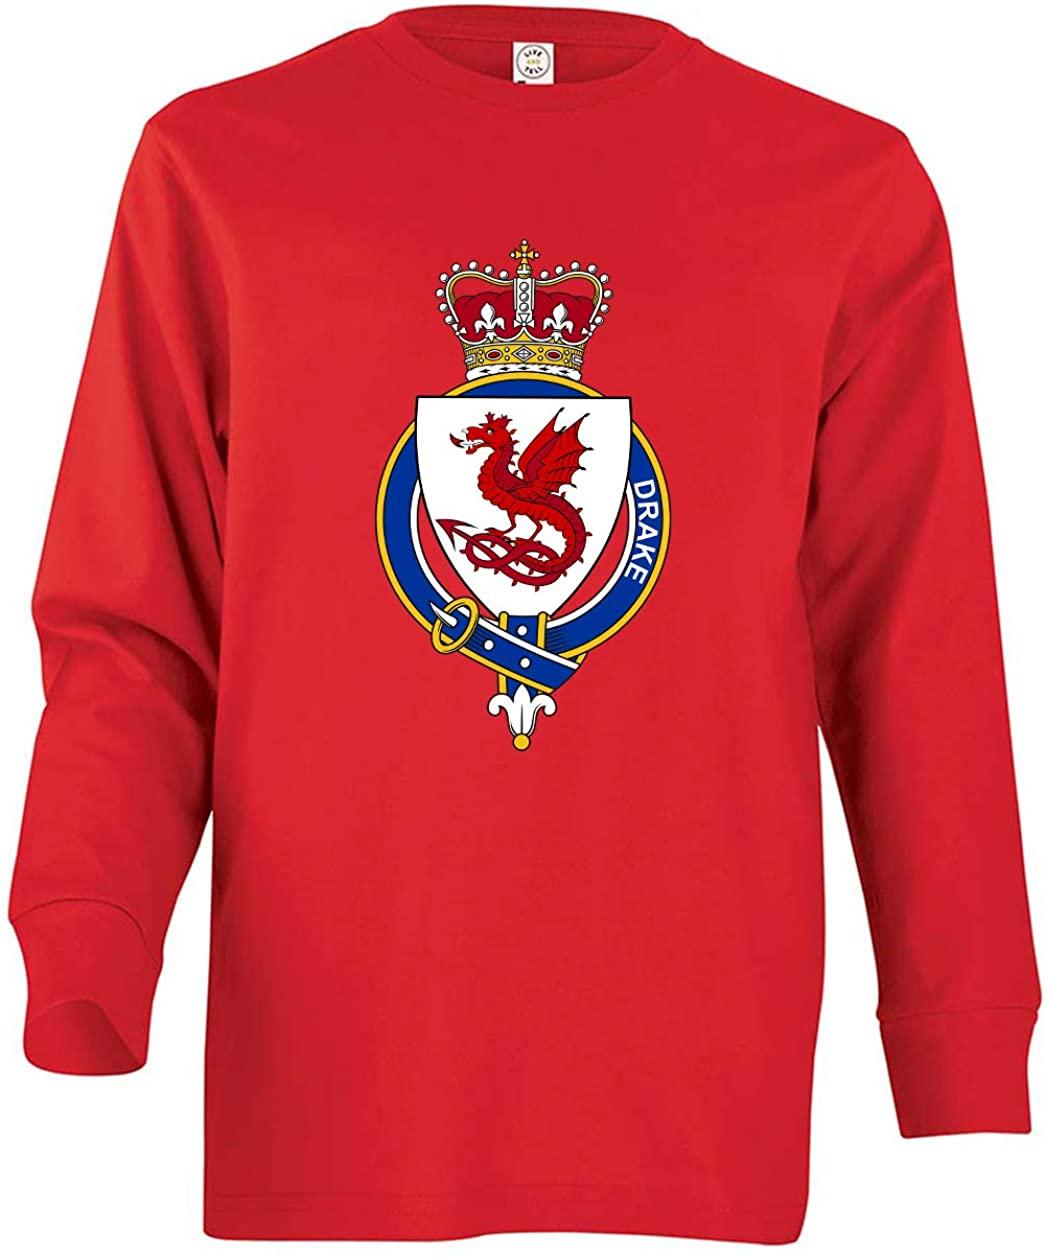 Tenacitee Girl's Youth English Garter Family Drake Long Sleeve T-Shirt